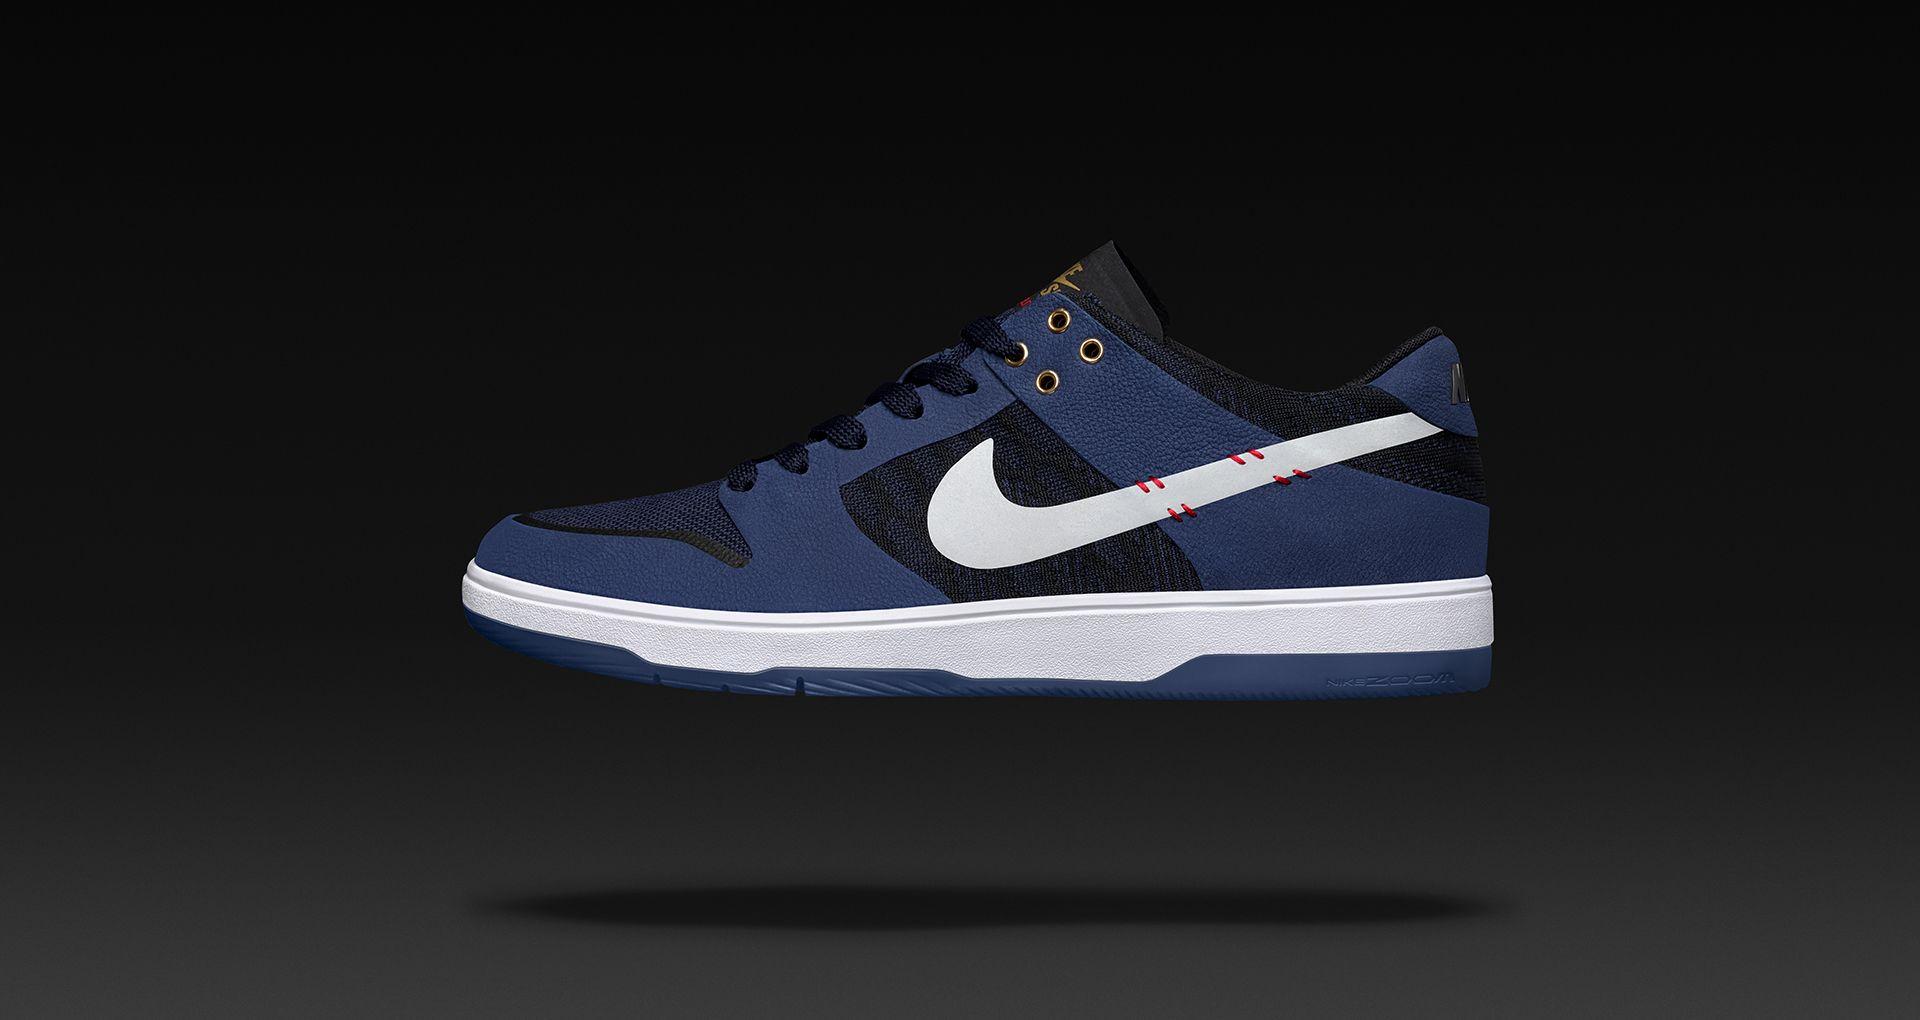 detailed look 75475 72550 Nike SB Dunk Low Elite 'Sean Malto'. Nike+ SNKRS